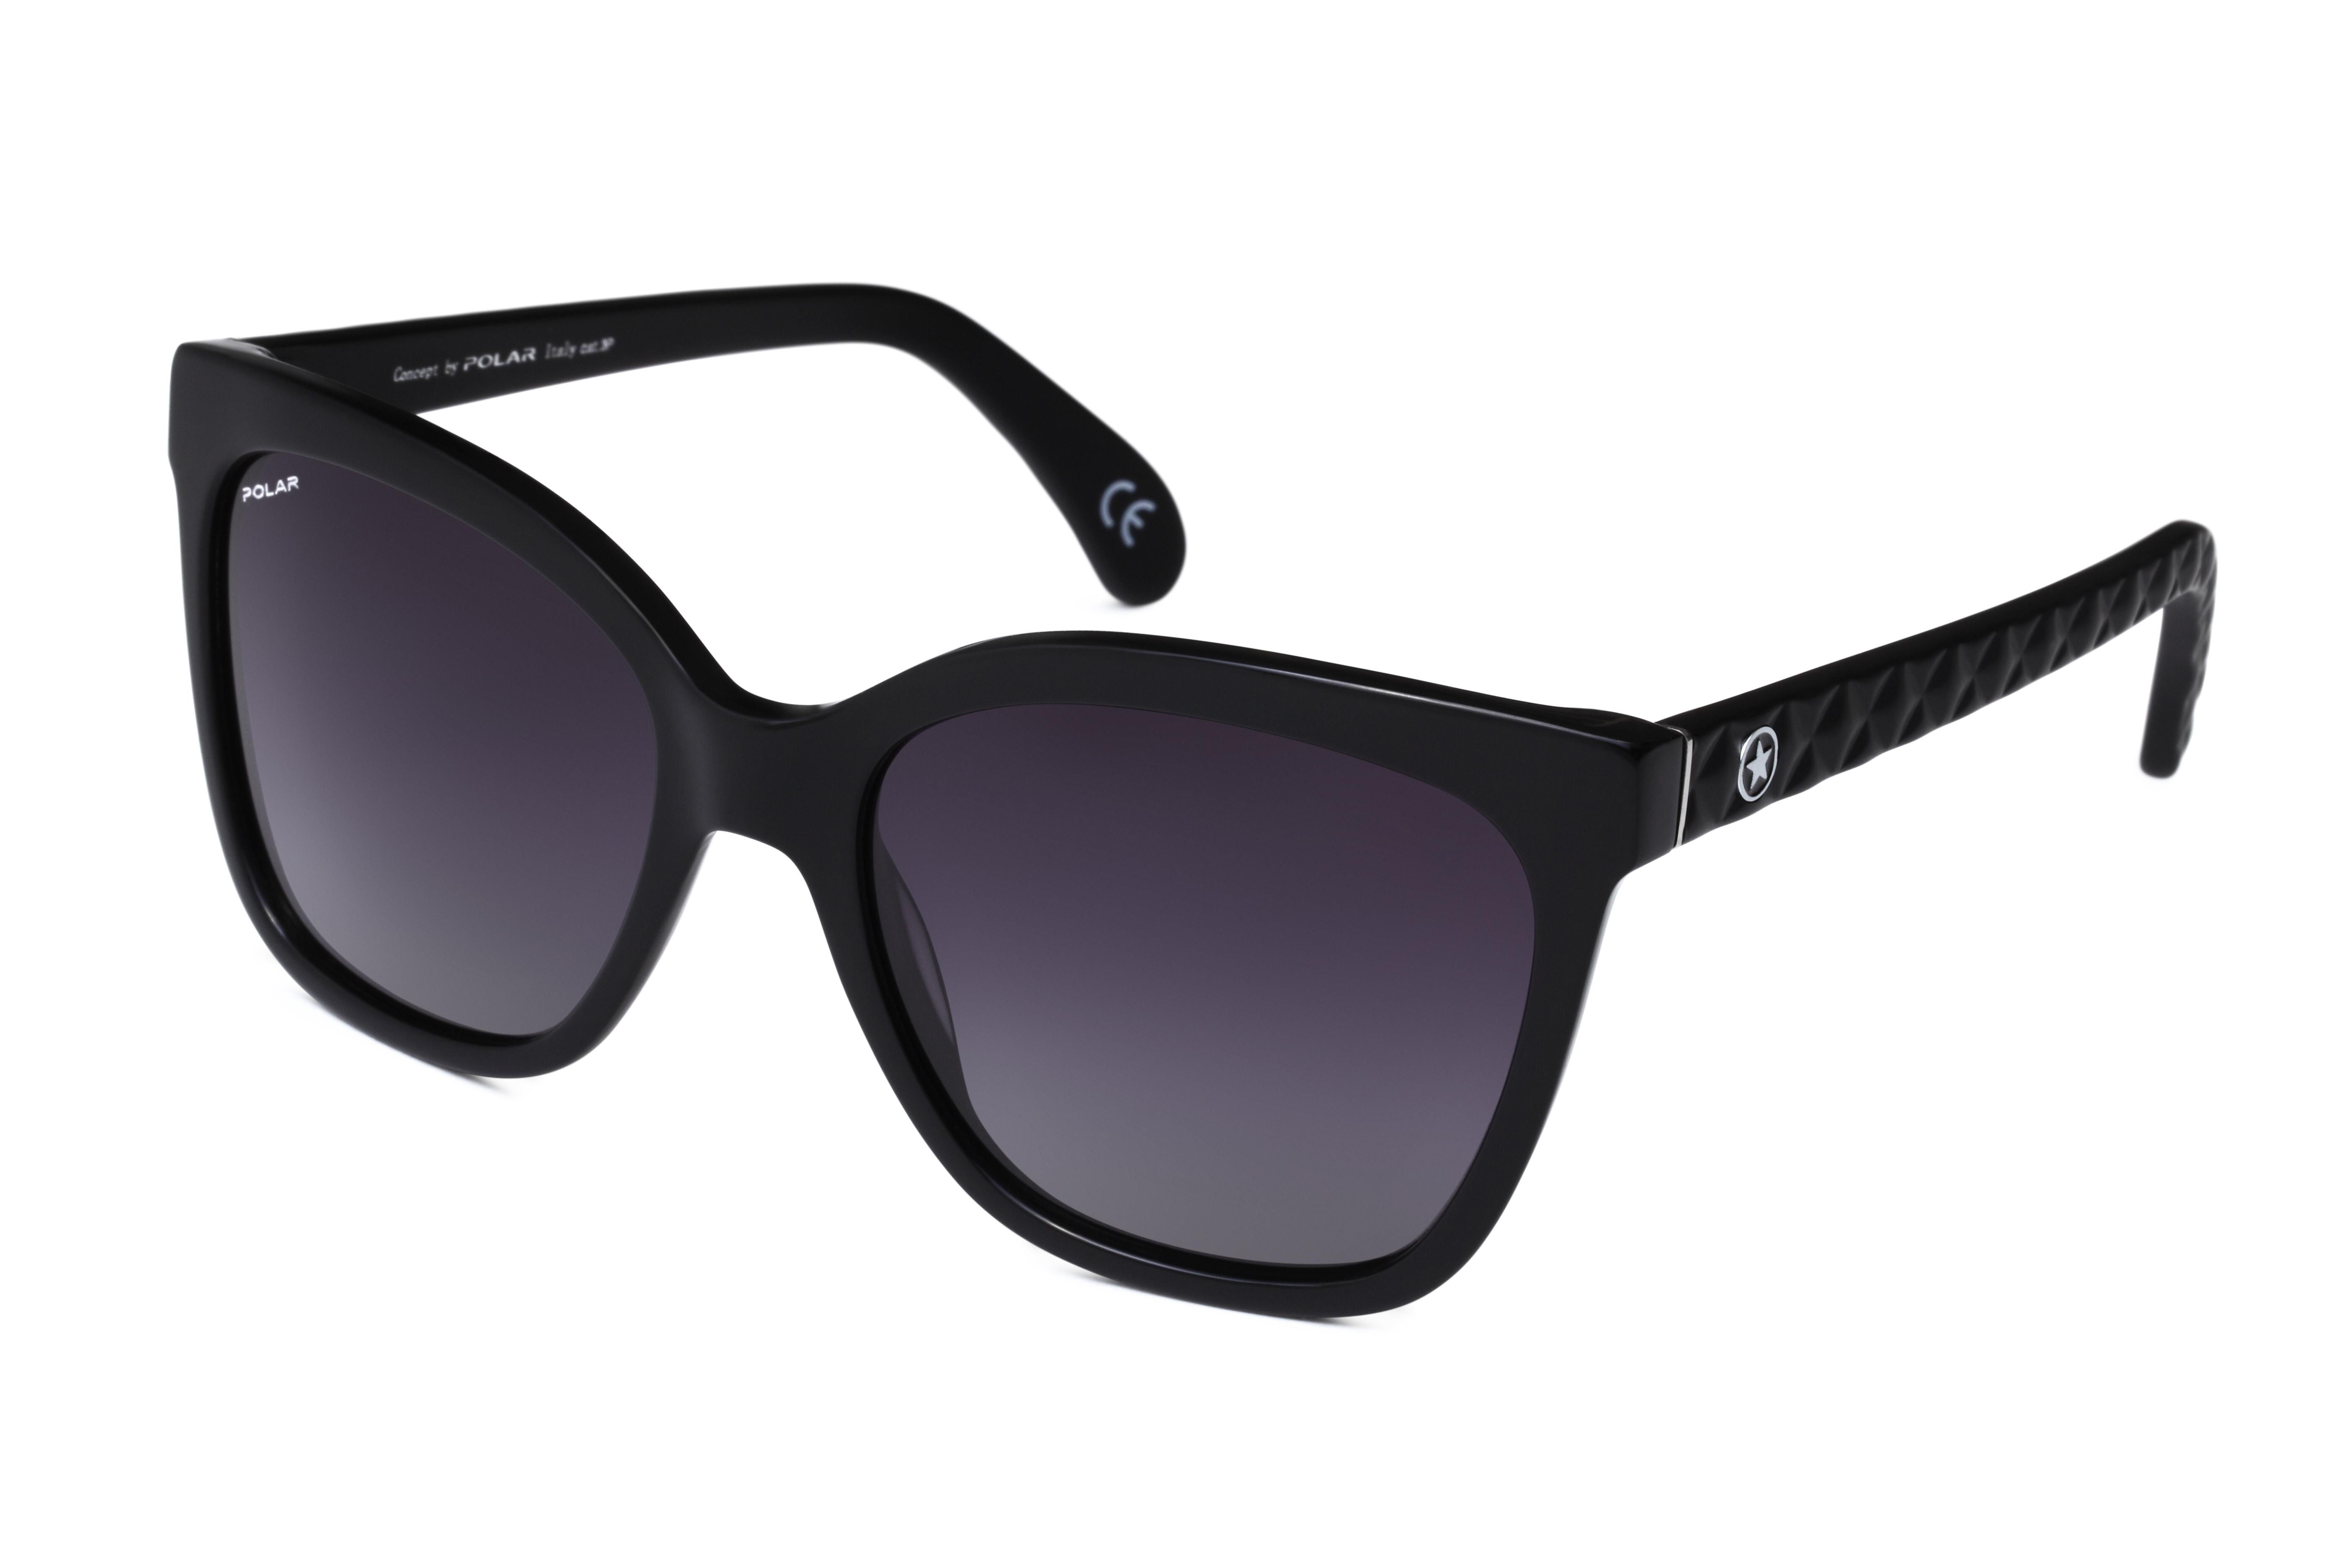 d0ce49768248 SUNGLASSES POLAR MODEL CELINE col.77 - Sunglasses and more